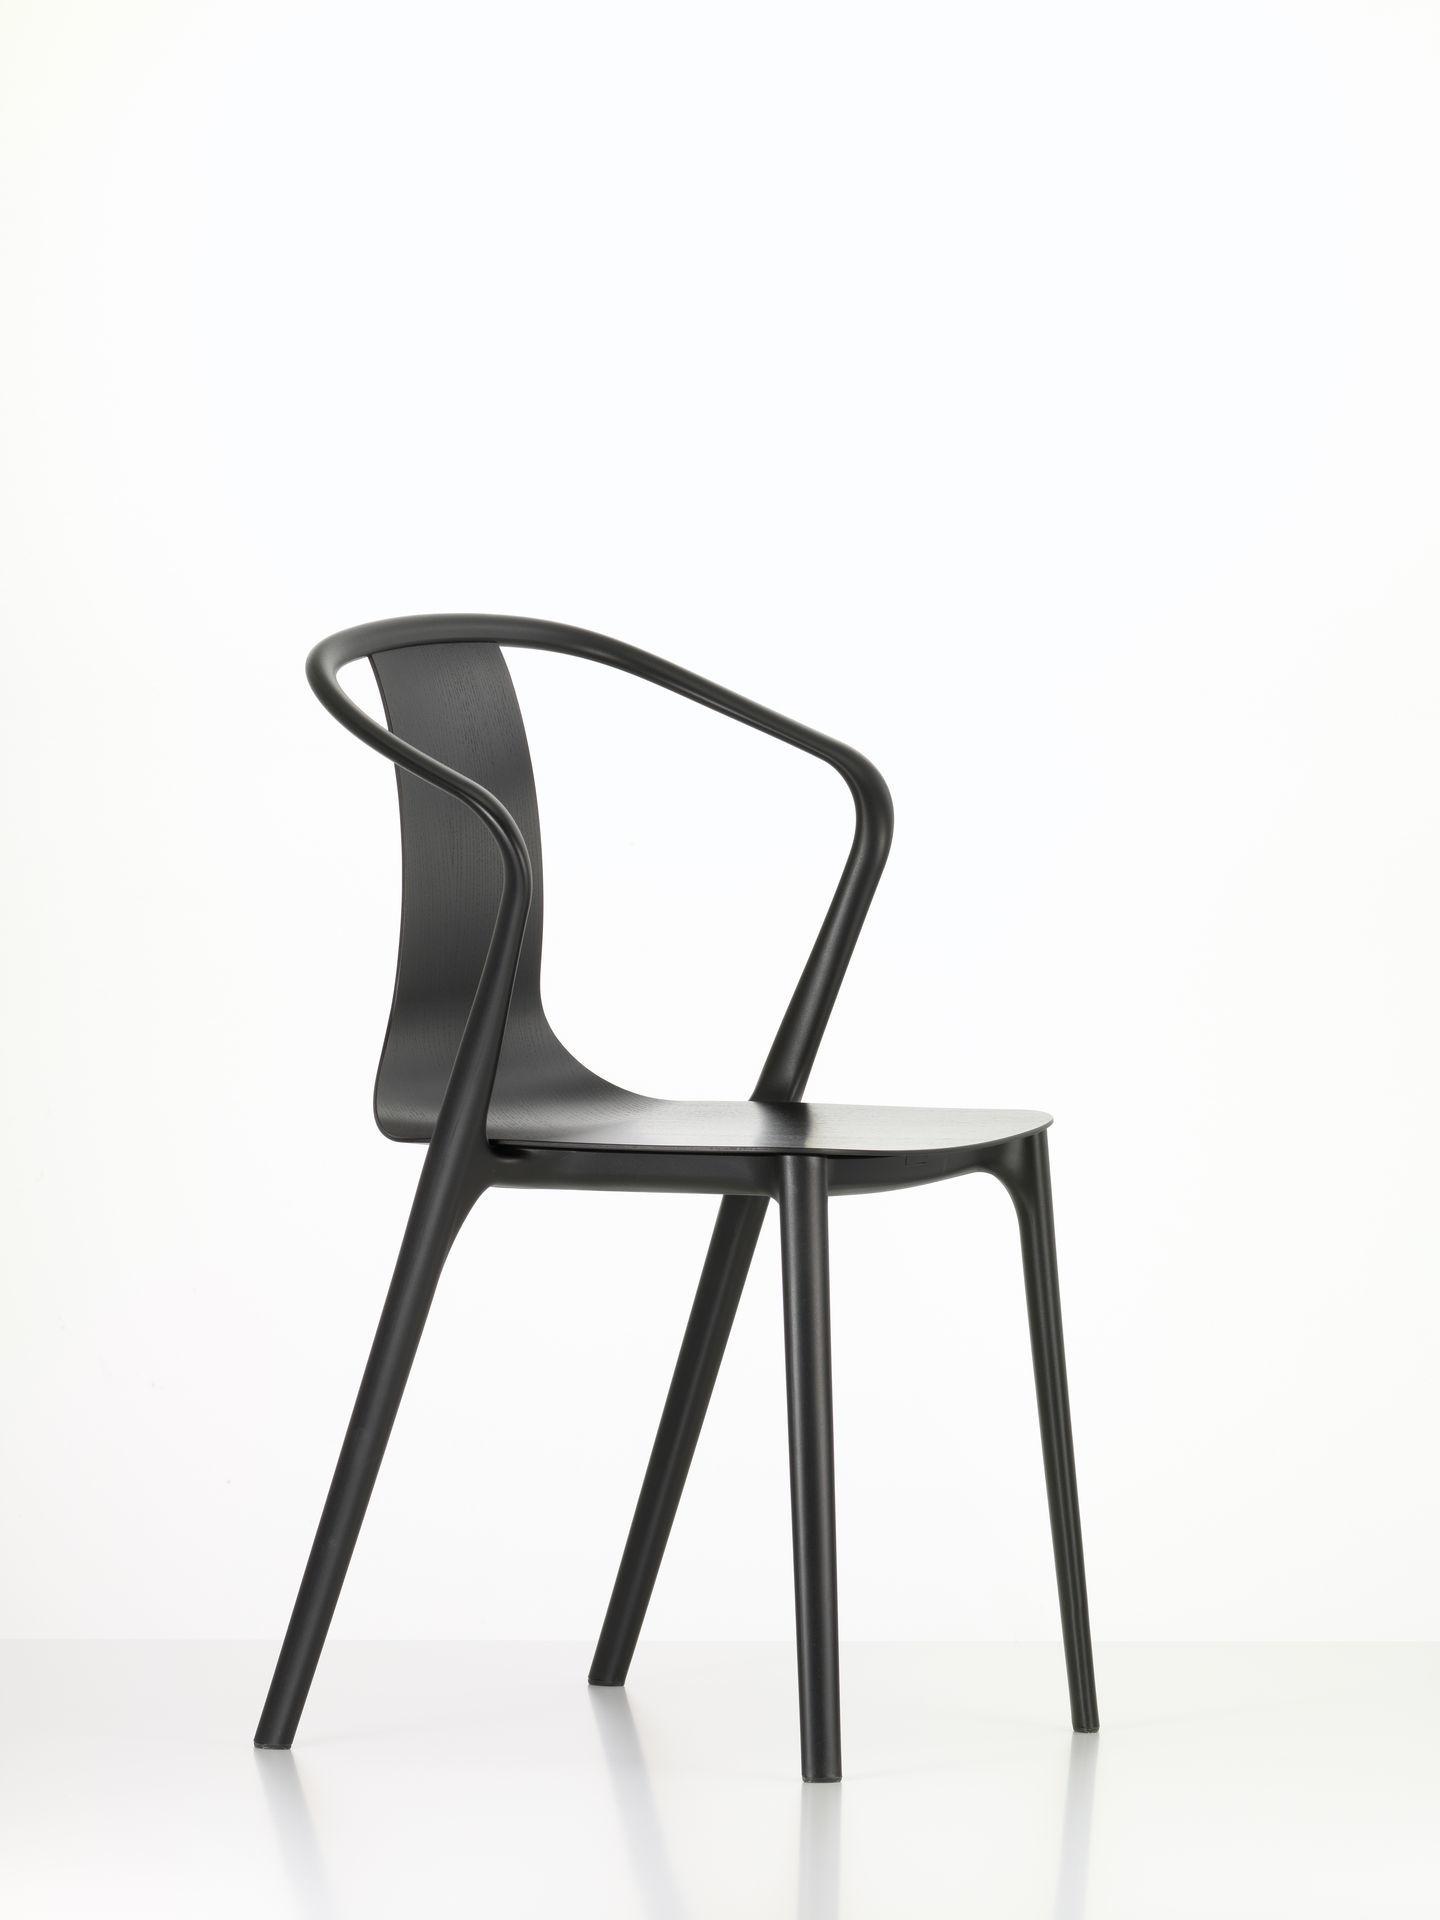 Belleville Armchair Plastic Chair Vitra